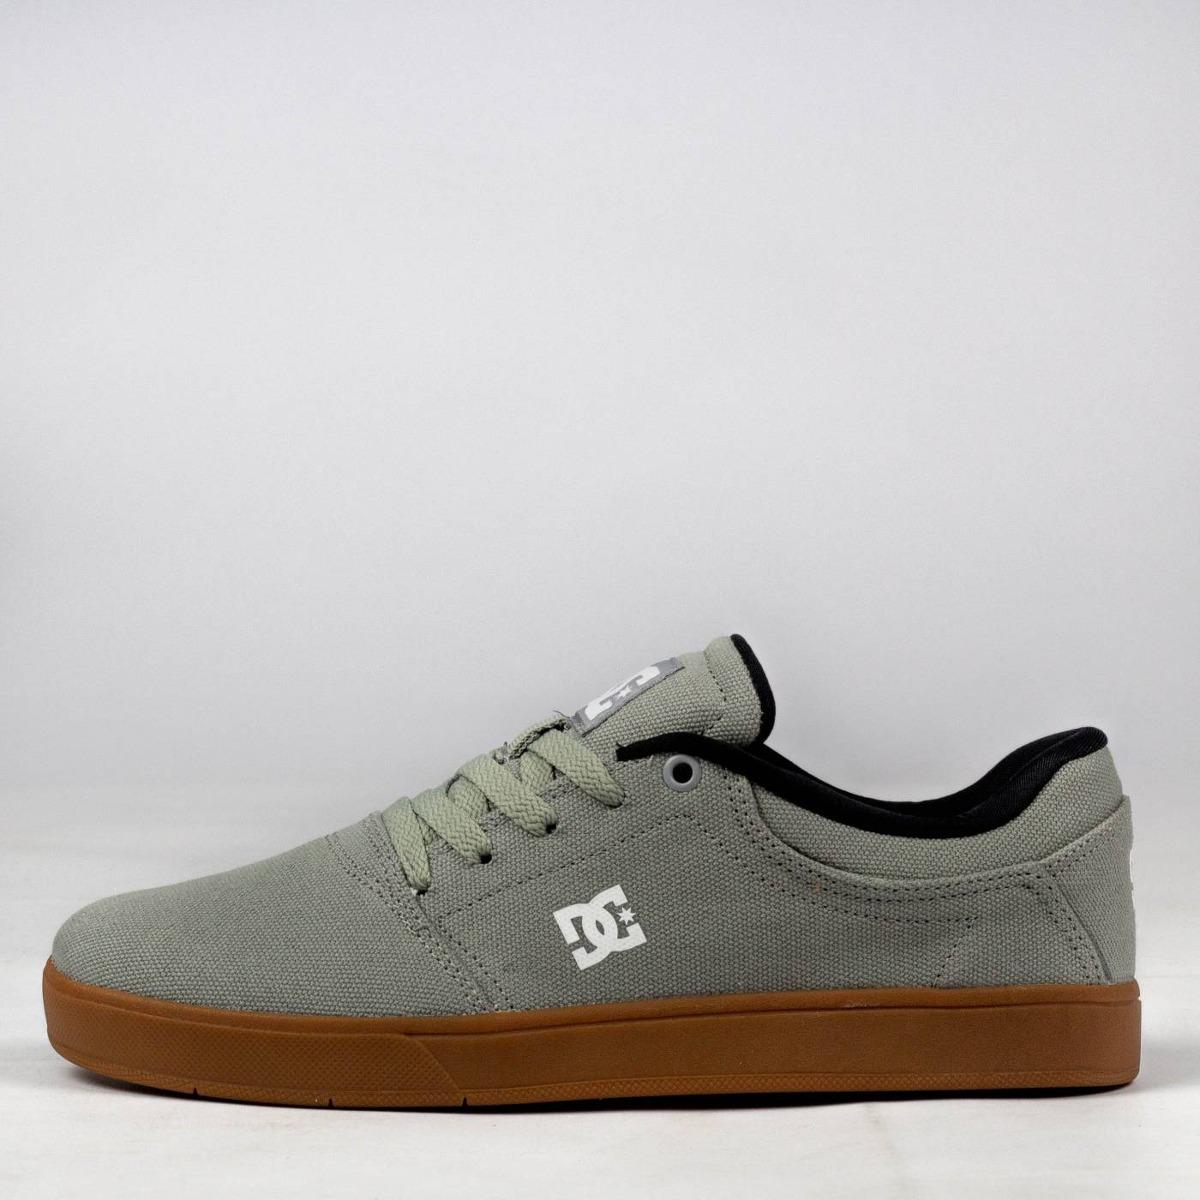 9268b1286 Tênis Masculino Skate Dc Shoes Crisis Tx La Grey/gum - R$ 260,00 em ...